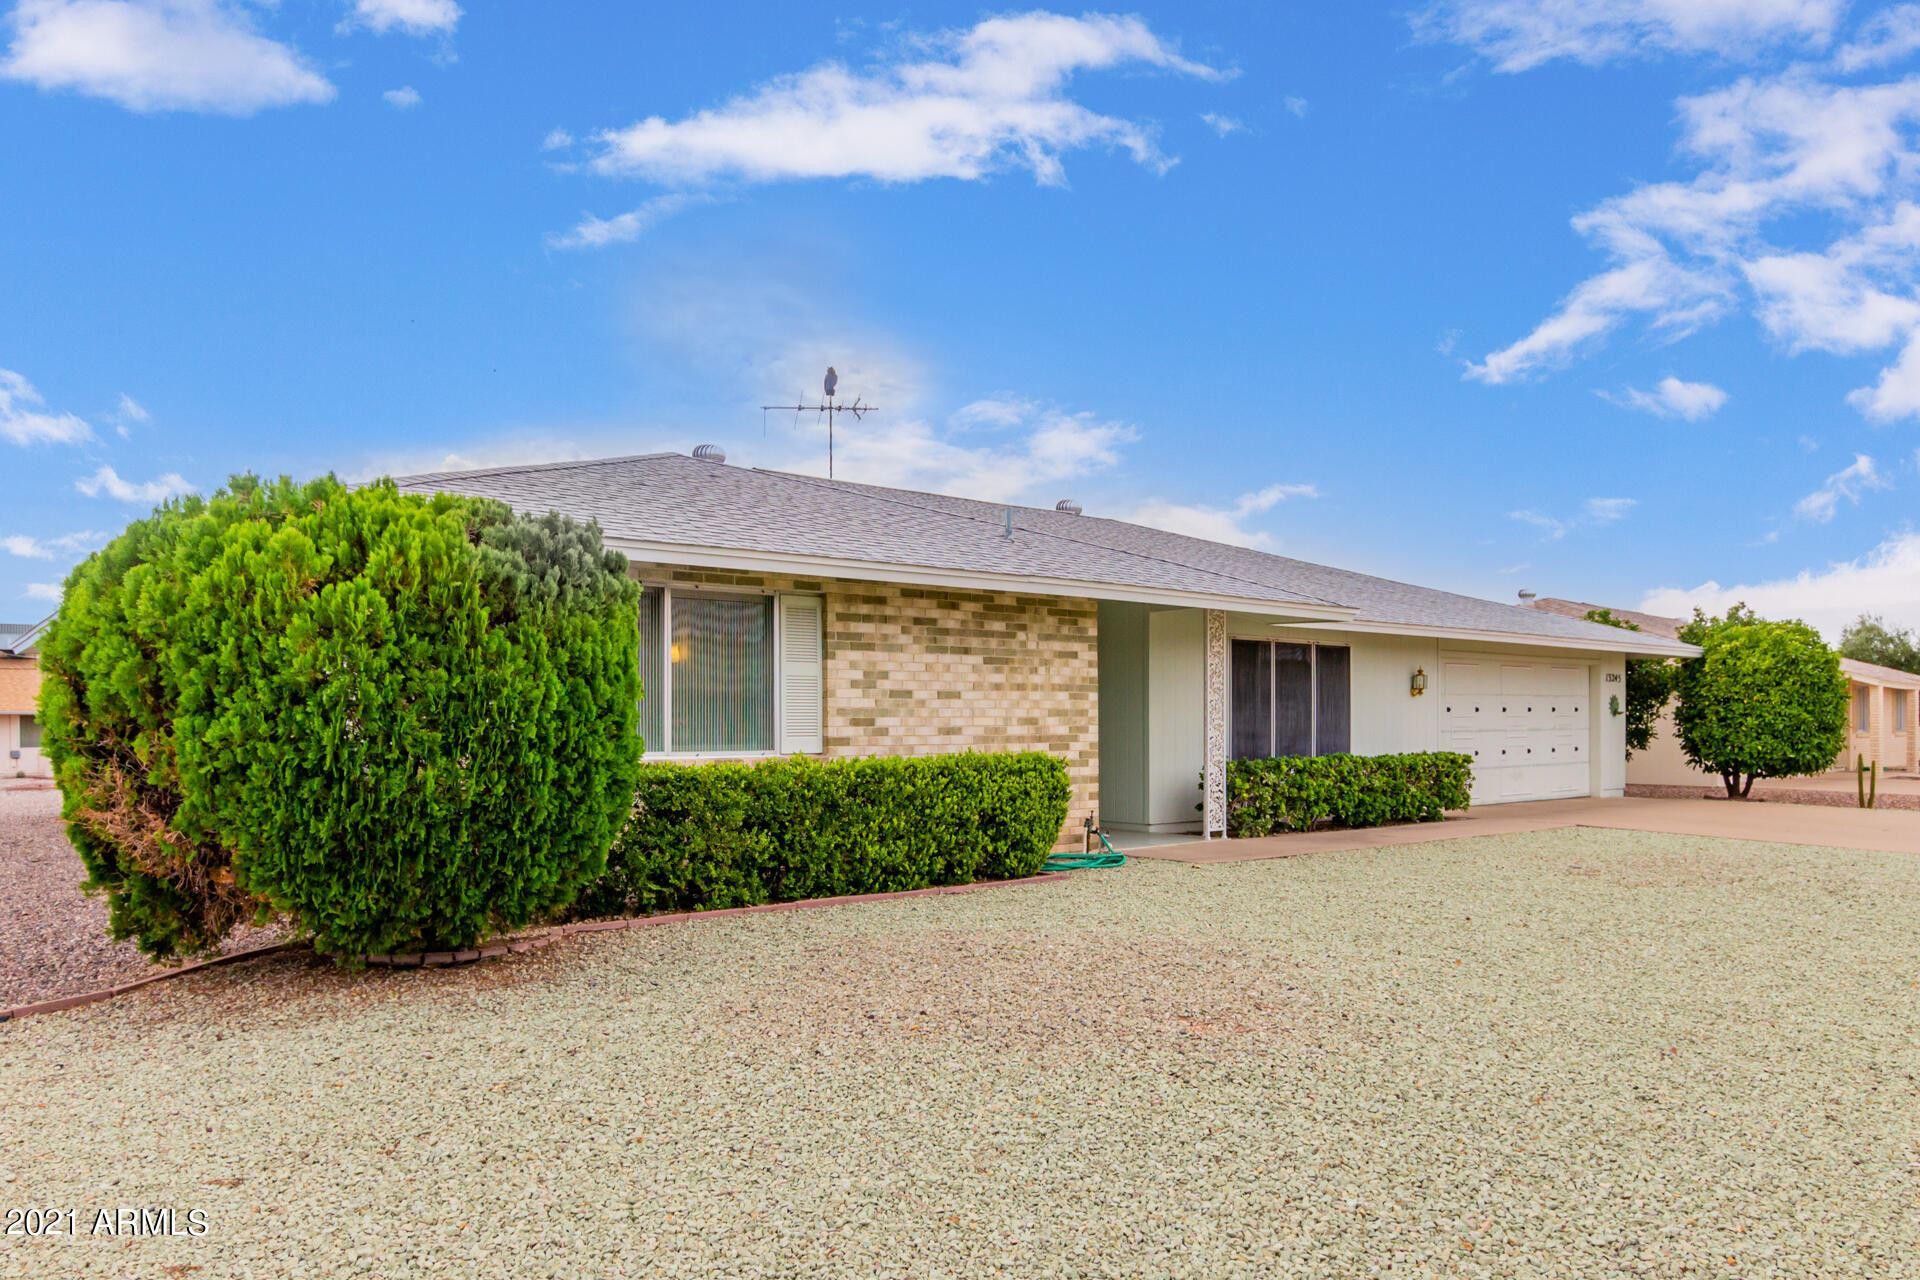 Photo of 13245 W POMEGRANATE Drive, Sun City West, AZ 85375 (MLS # 6305231)